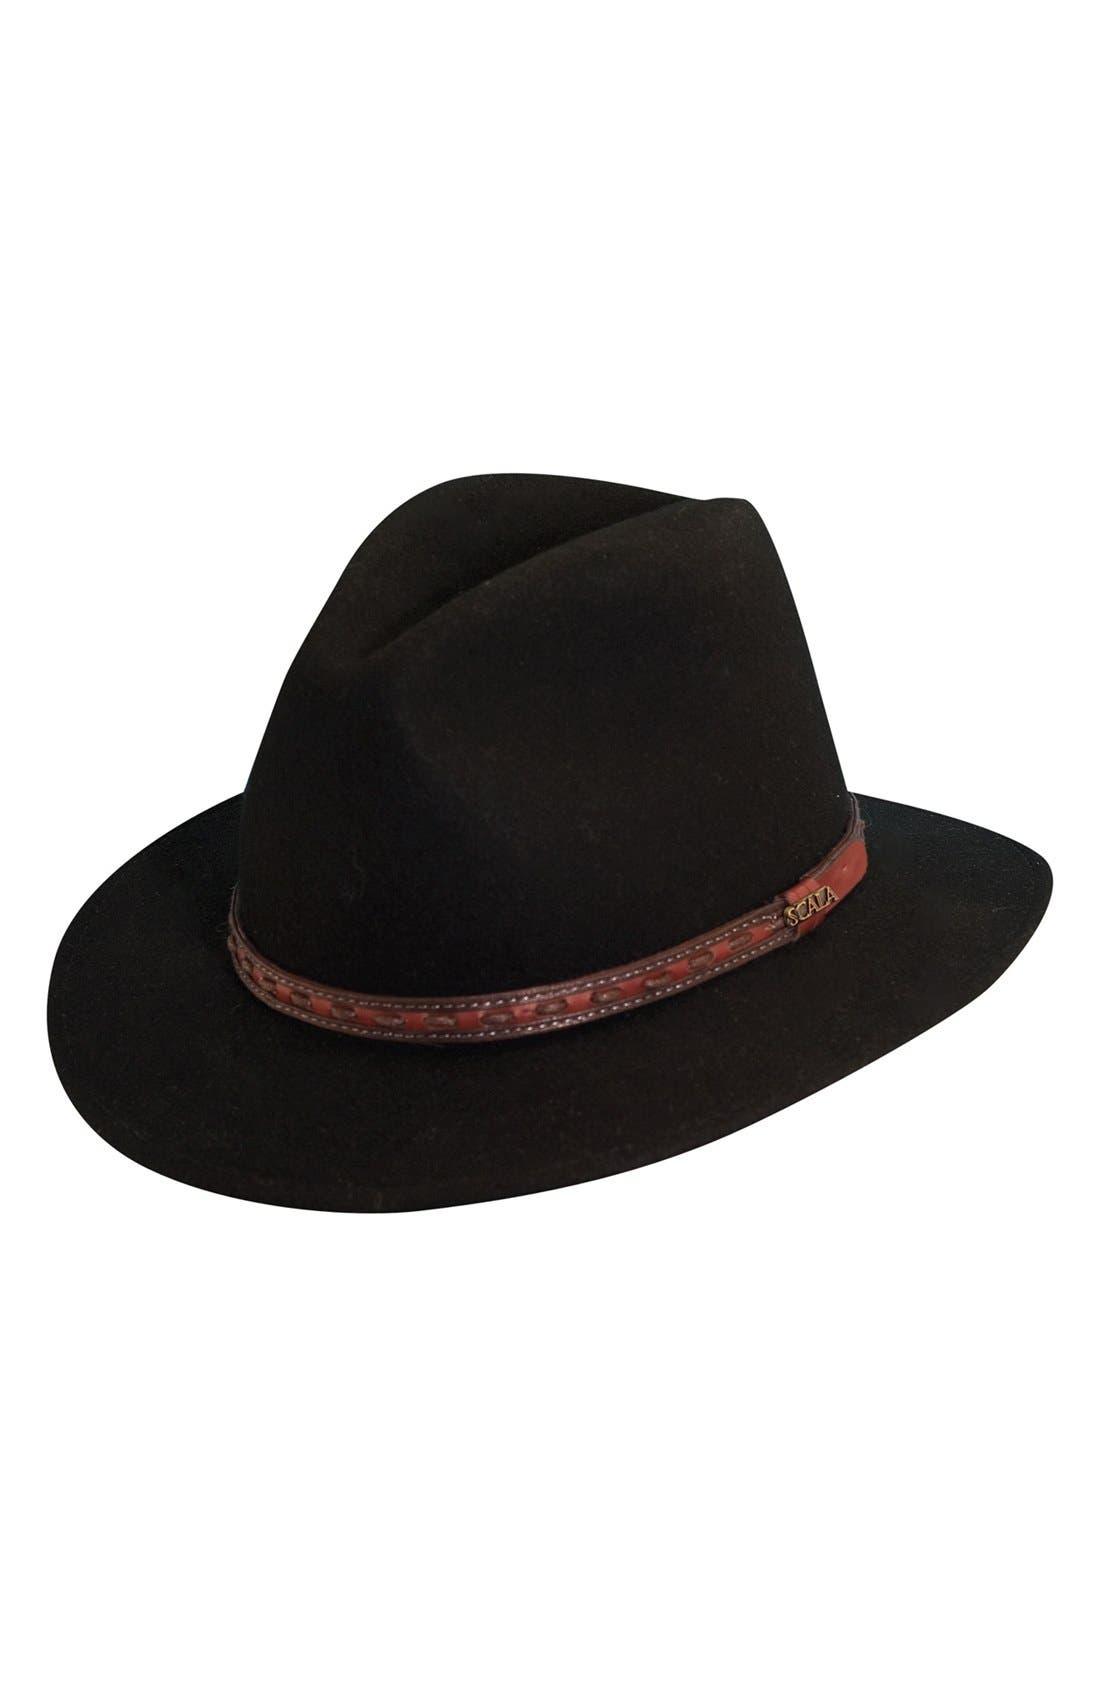 'Classico' Crushable Felt Safari Hat,                             Main thumbnail 1, color,                             BLACK